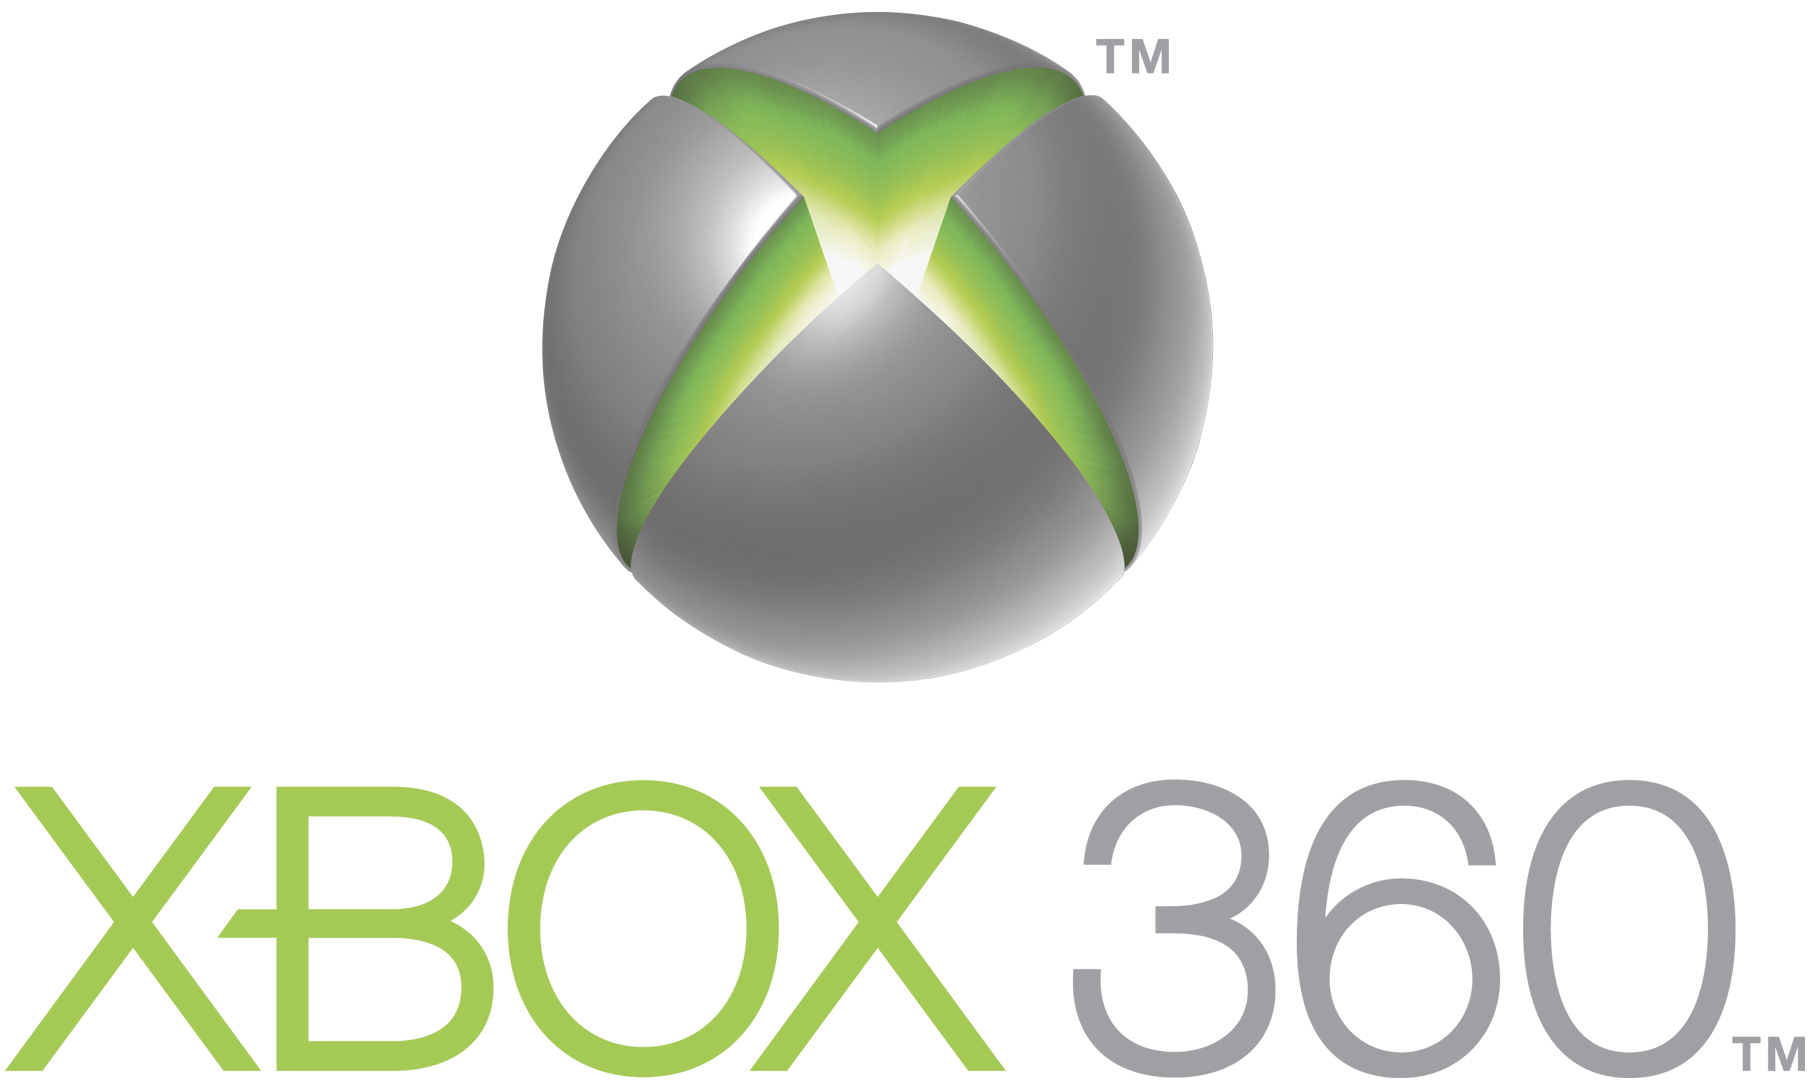 xbox 360 logo png transparent #2488